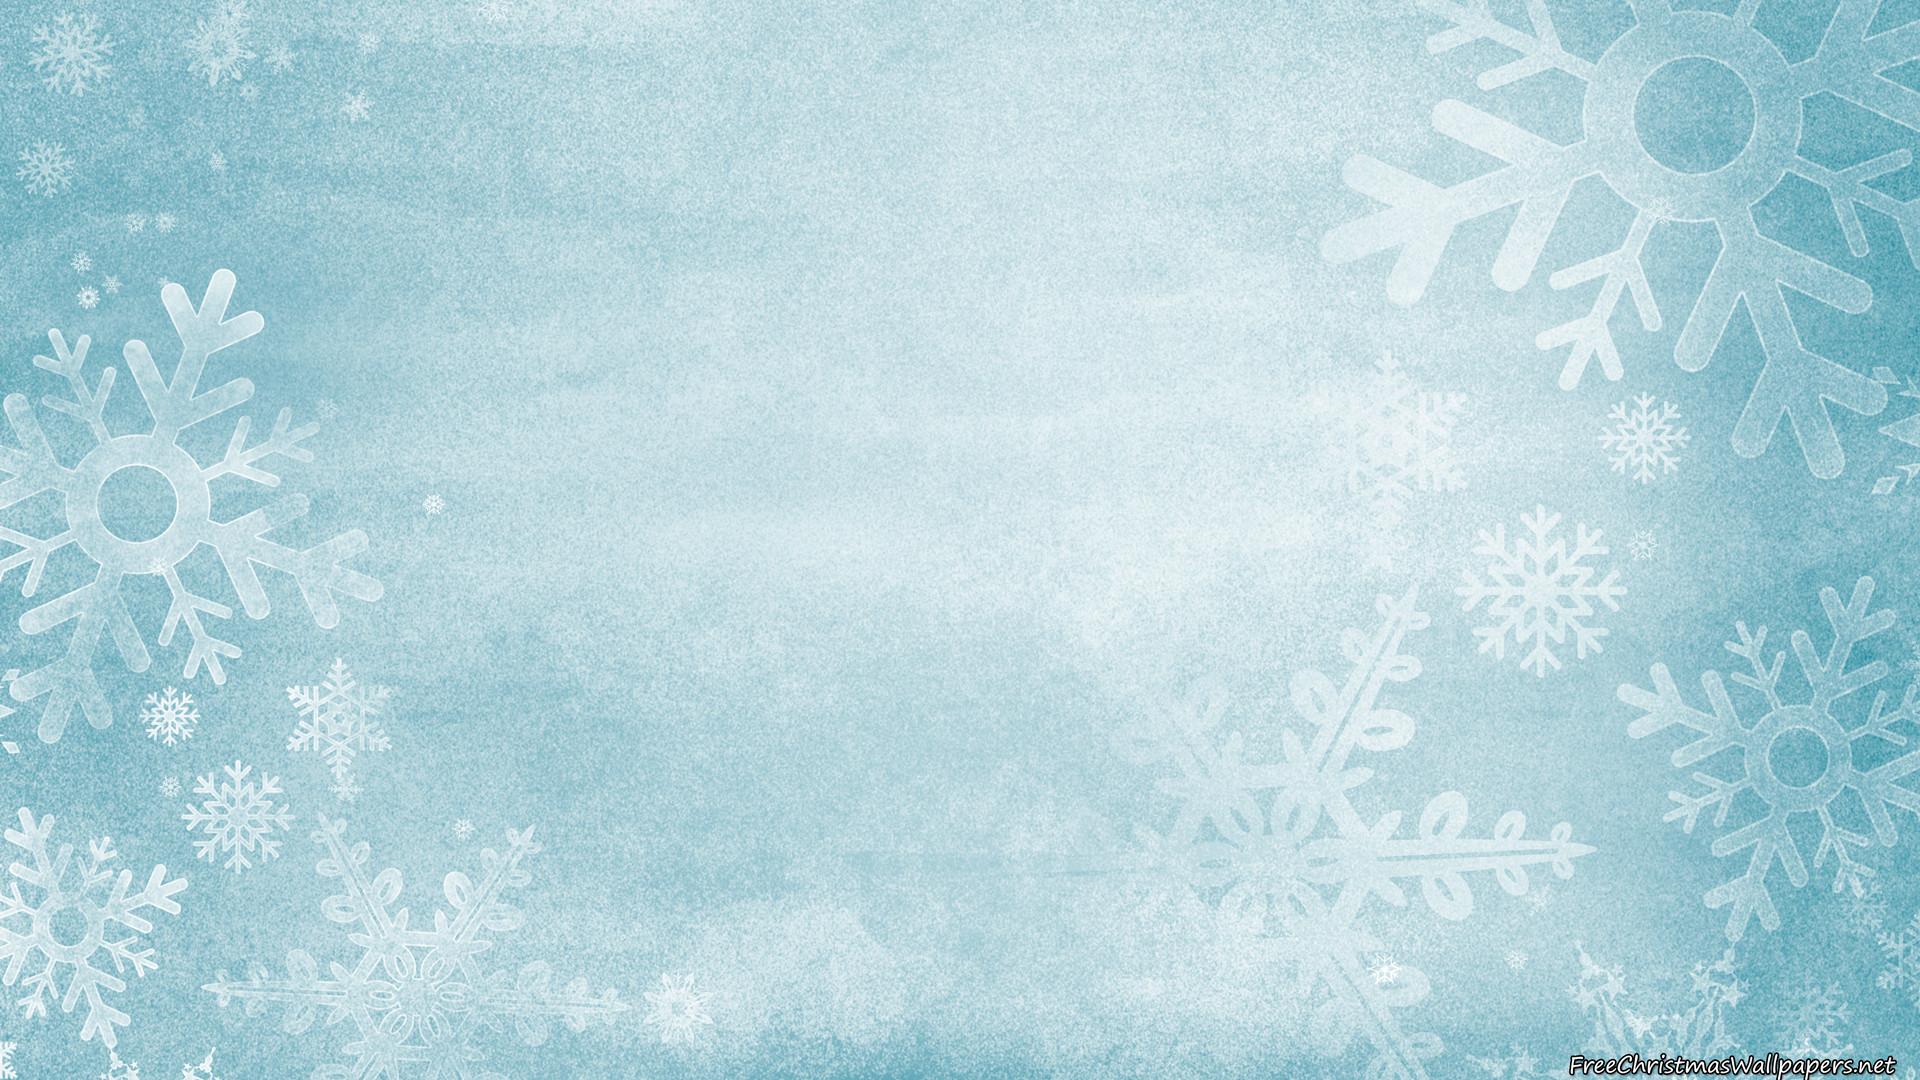 Related Christmas Background Background Image